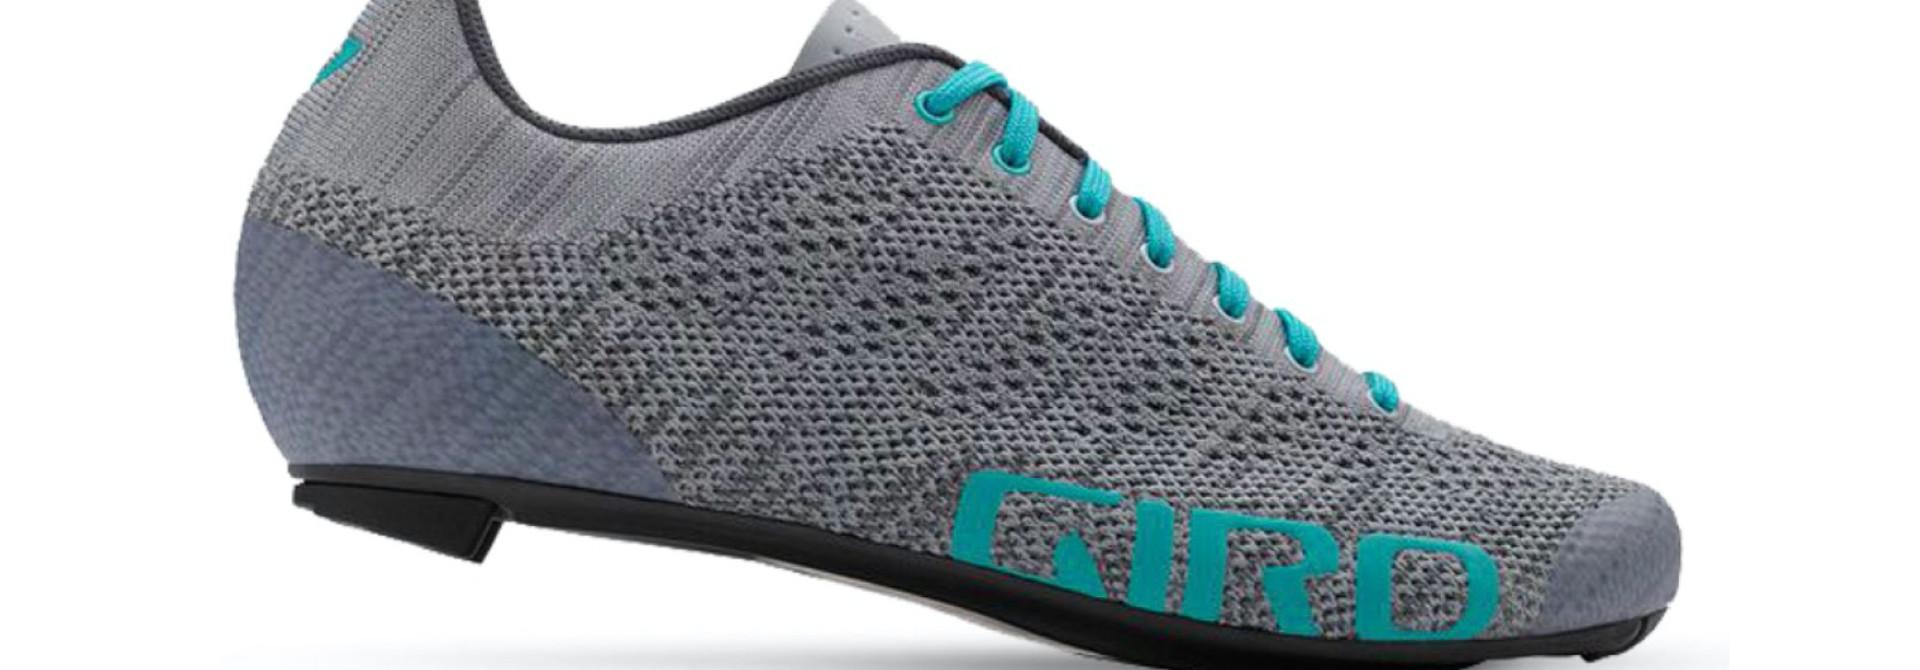 Womens Empire E70 Knit Road Shoe